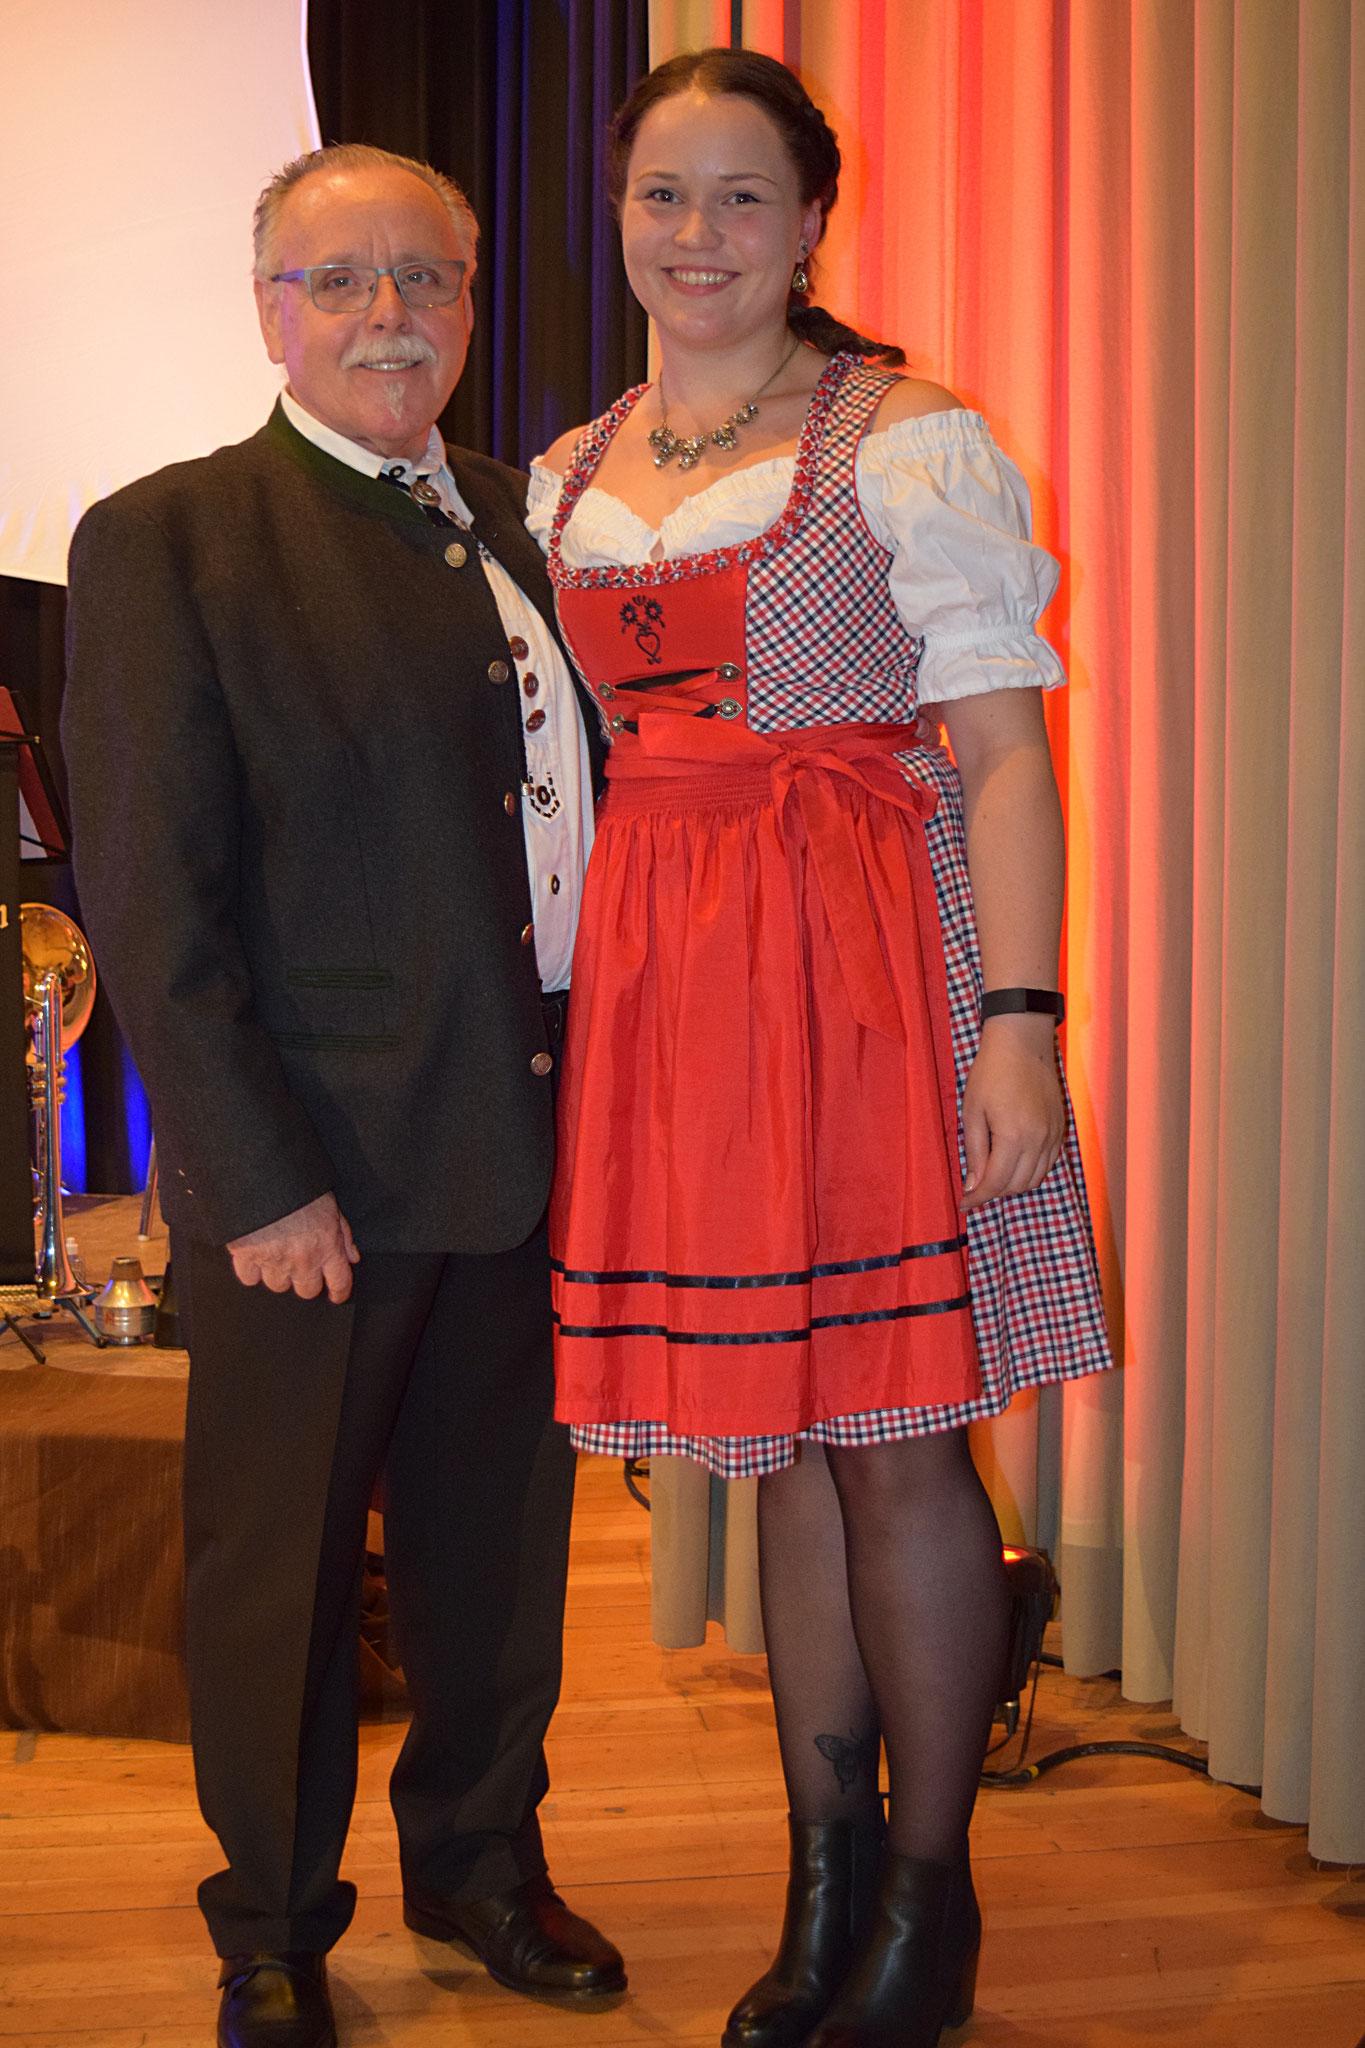 Harald Lesch mit Jacqueline Rössler